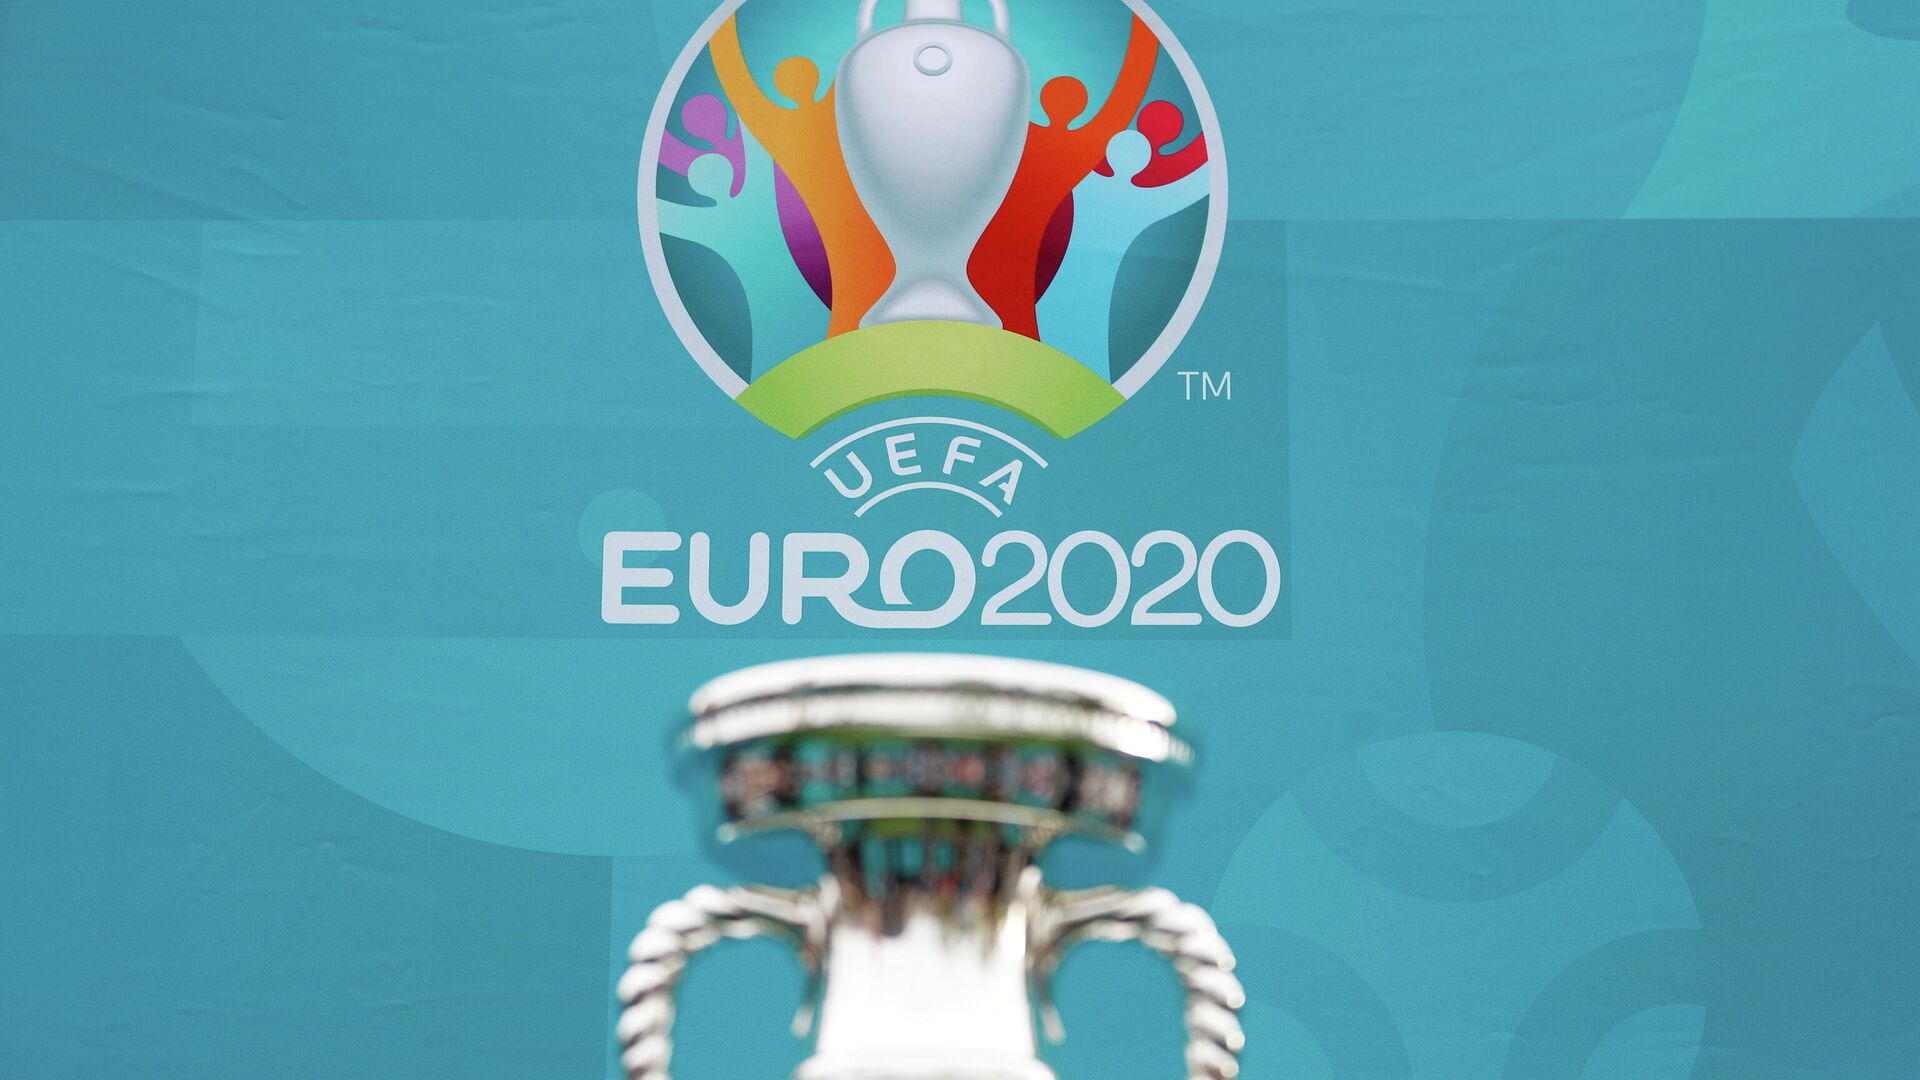 UEFA (Symbolbild) - SNA, 1920, 05.07.2021